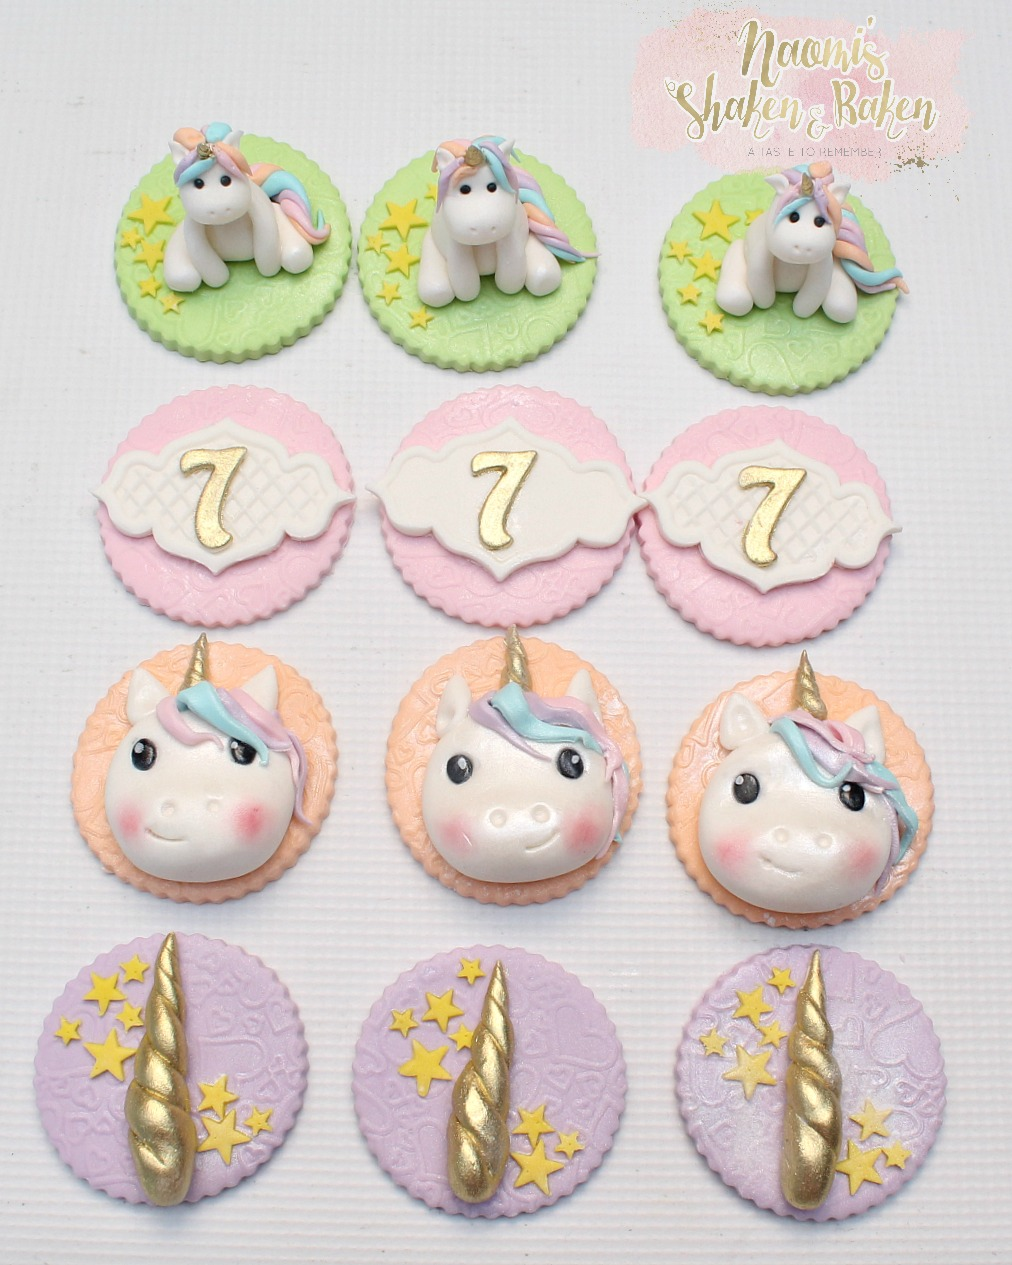 Edible unicorn cupcake toppers